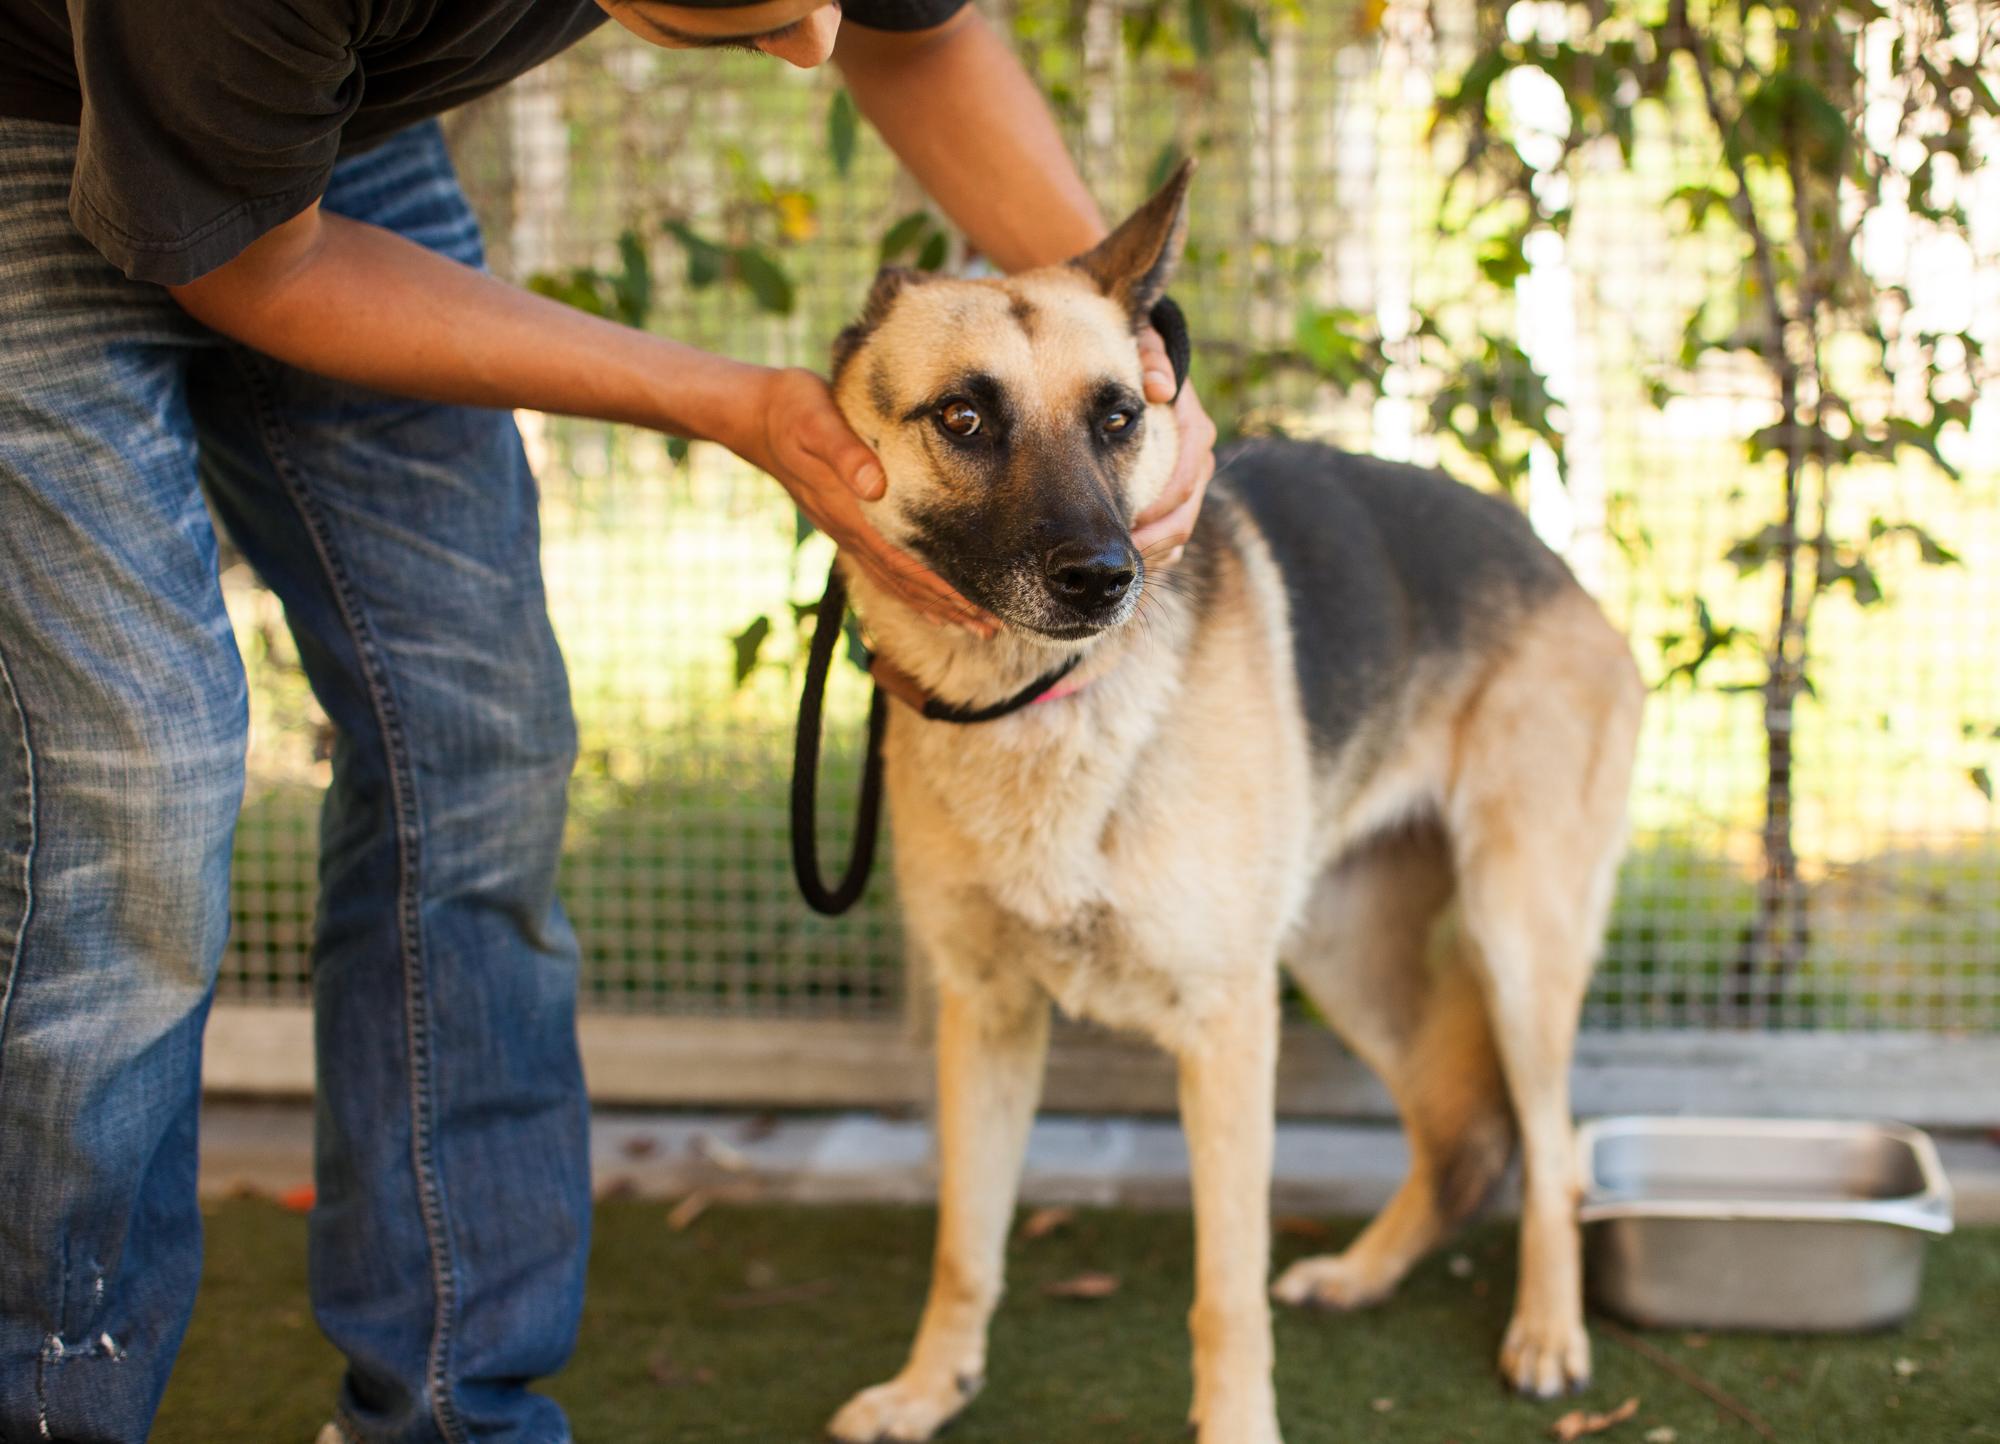 026_animal-photography-cats-dogs-volunteer_MG_4816.jpg